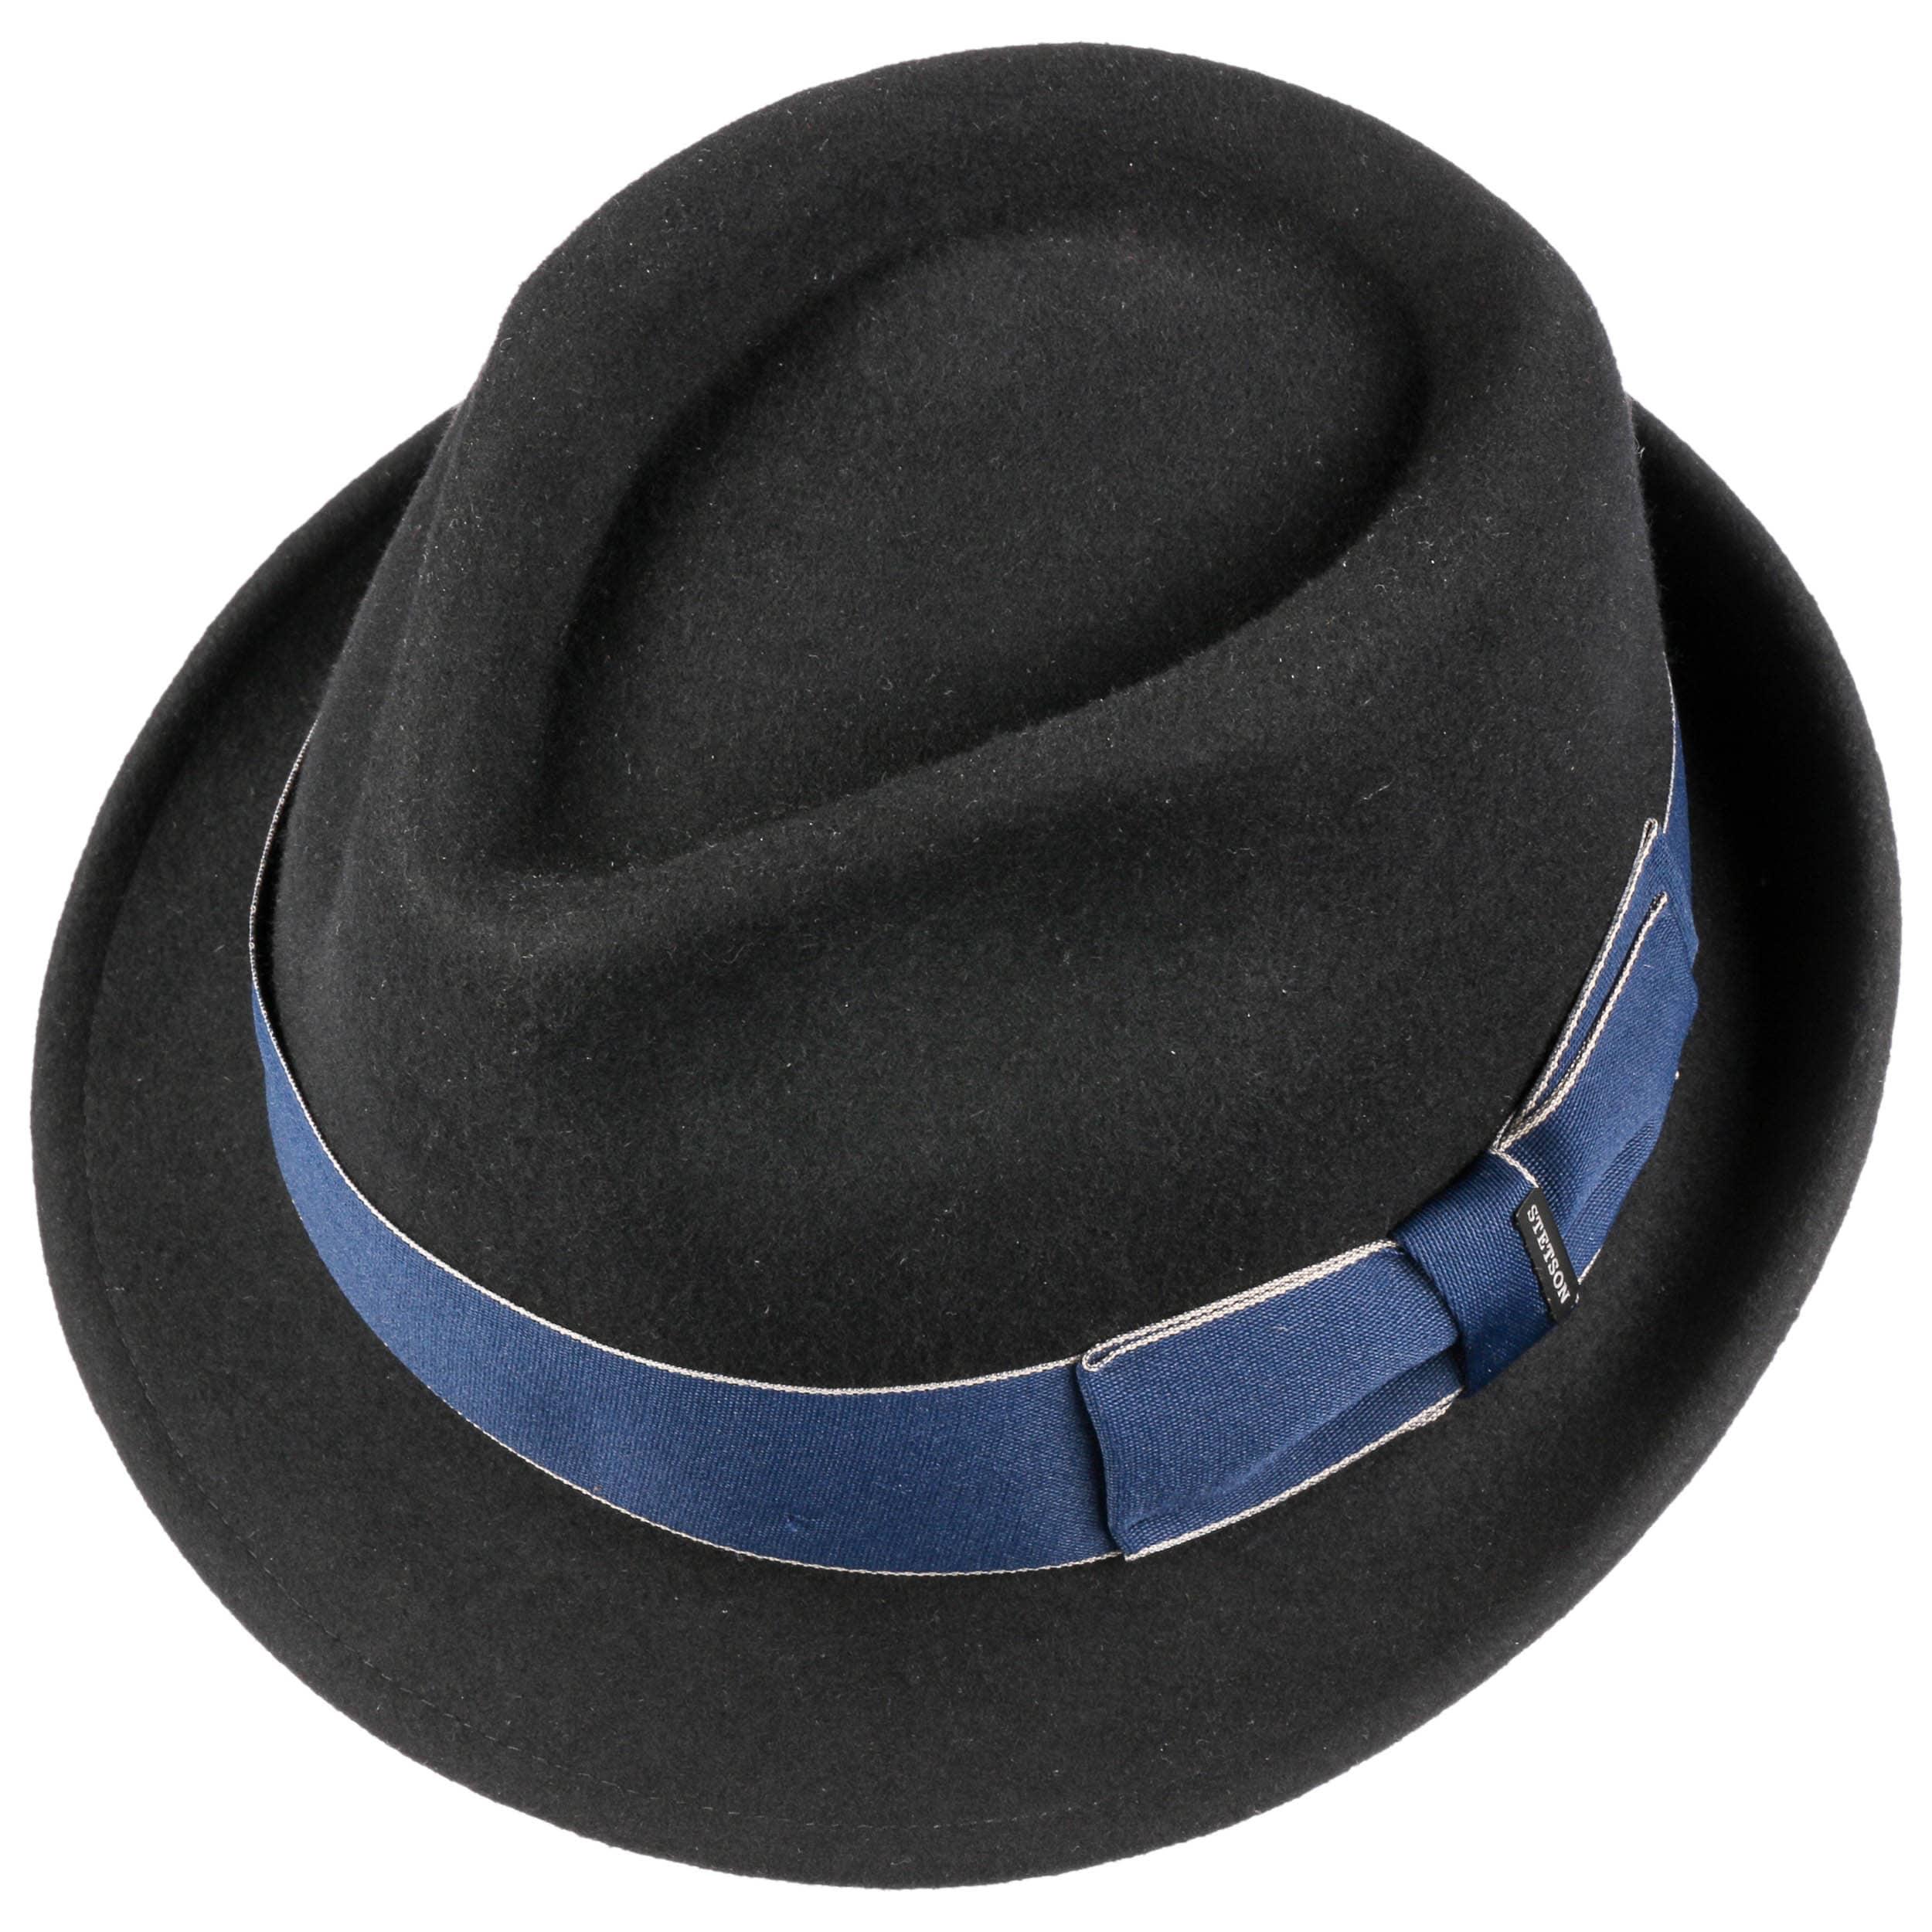 e553cd4b49b2e0 Boston Blue Ribbon Wool Felt Hat by Stetson - black 1 ...